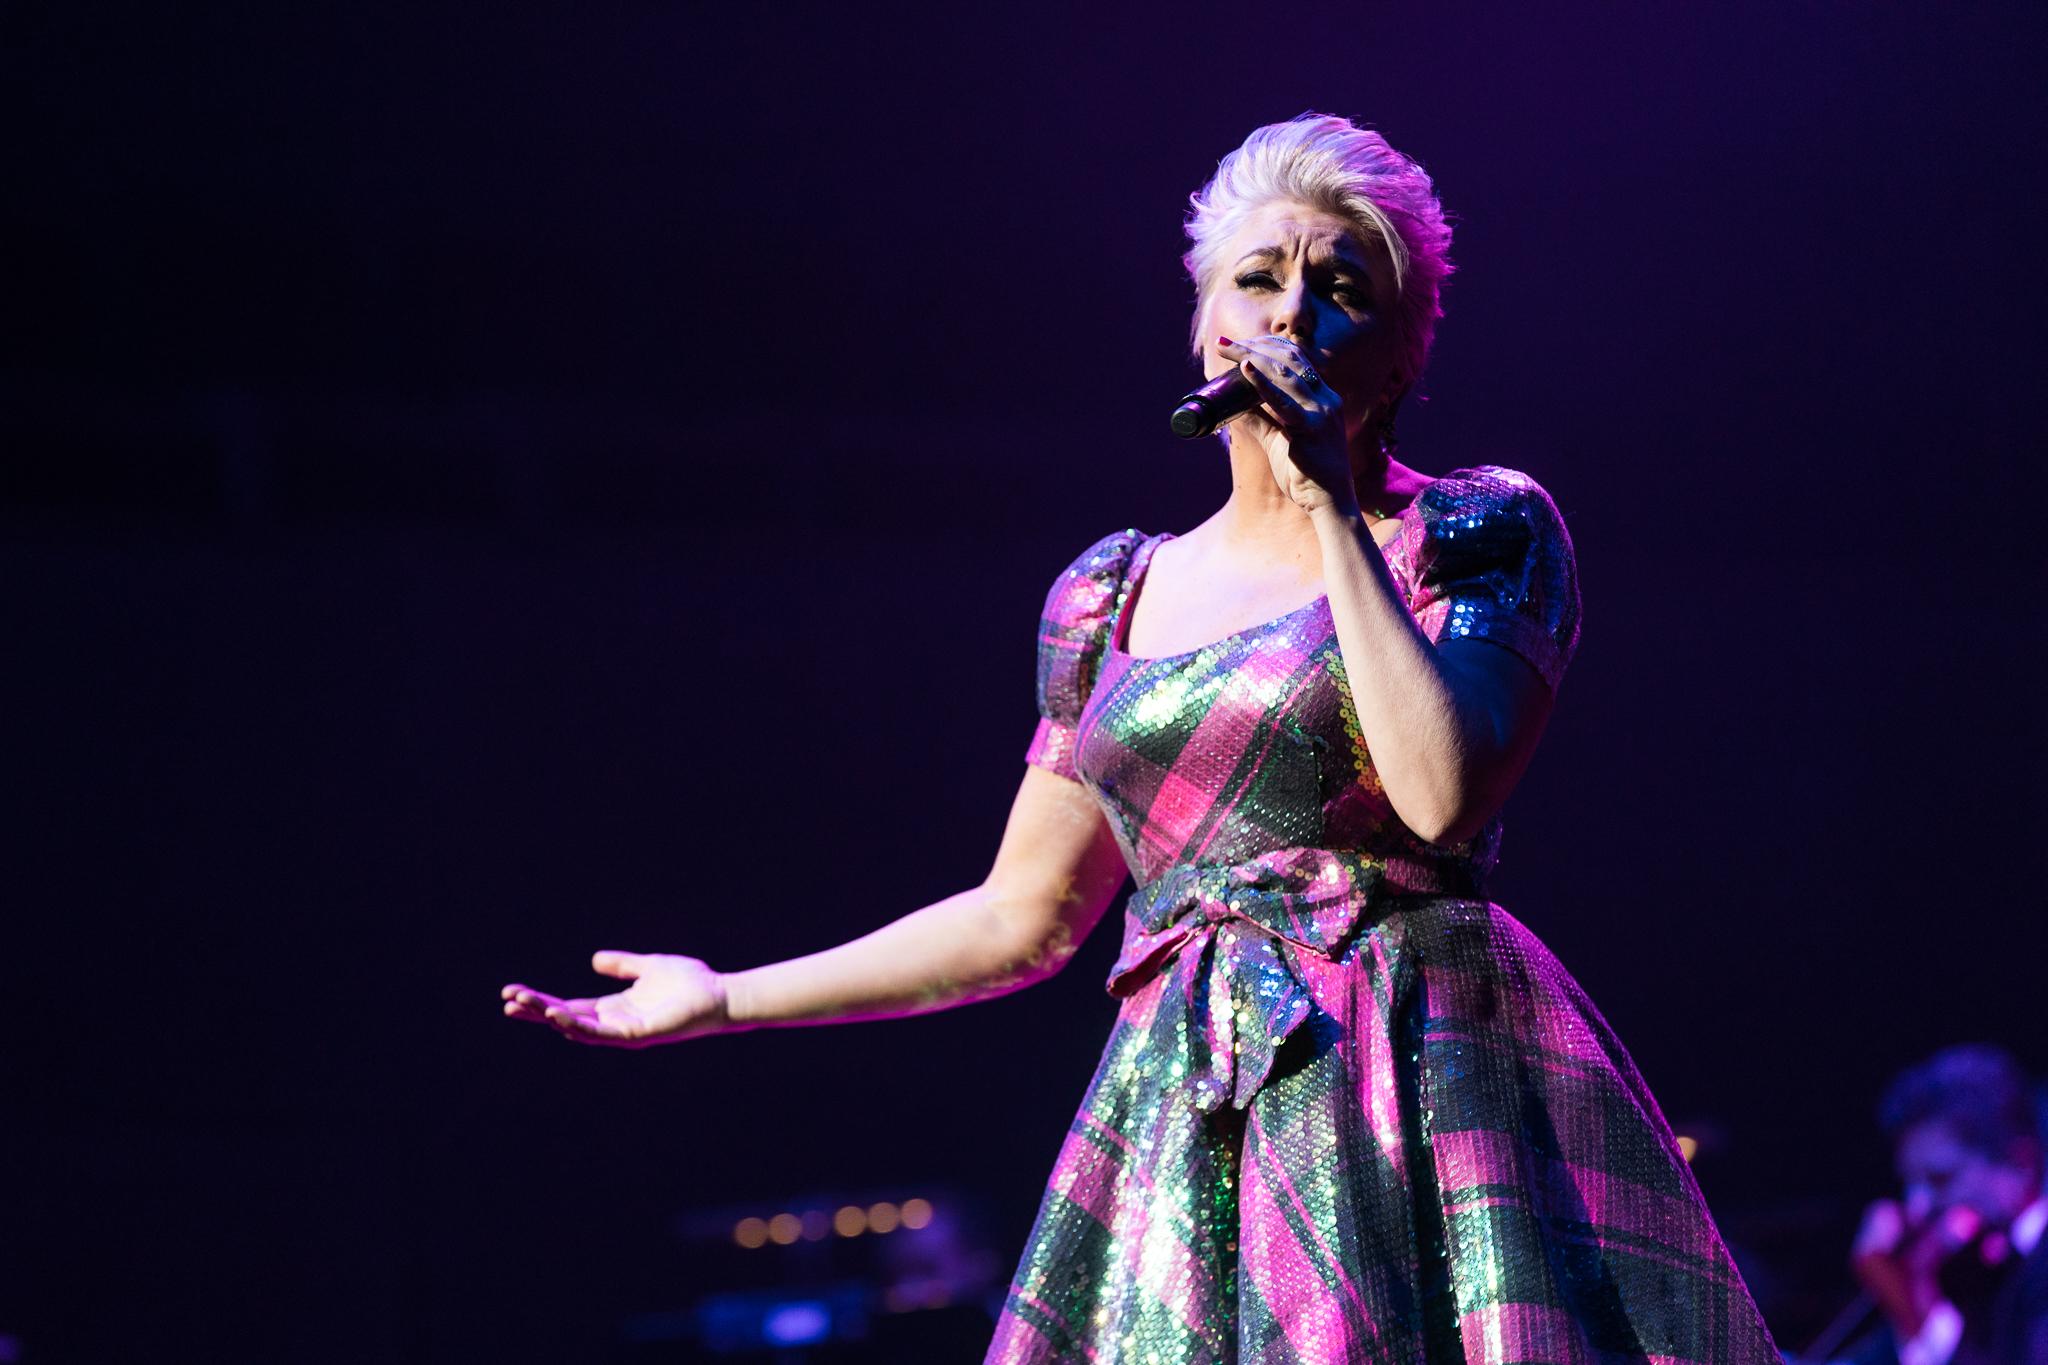 Melinda Schneider in sparkling dress singing on stage